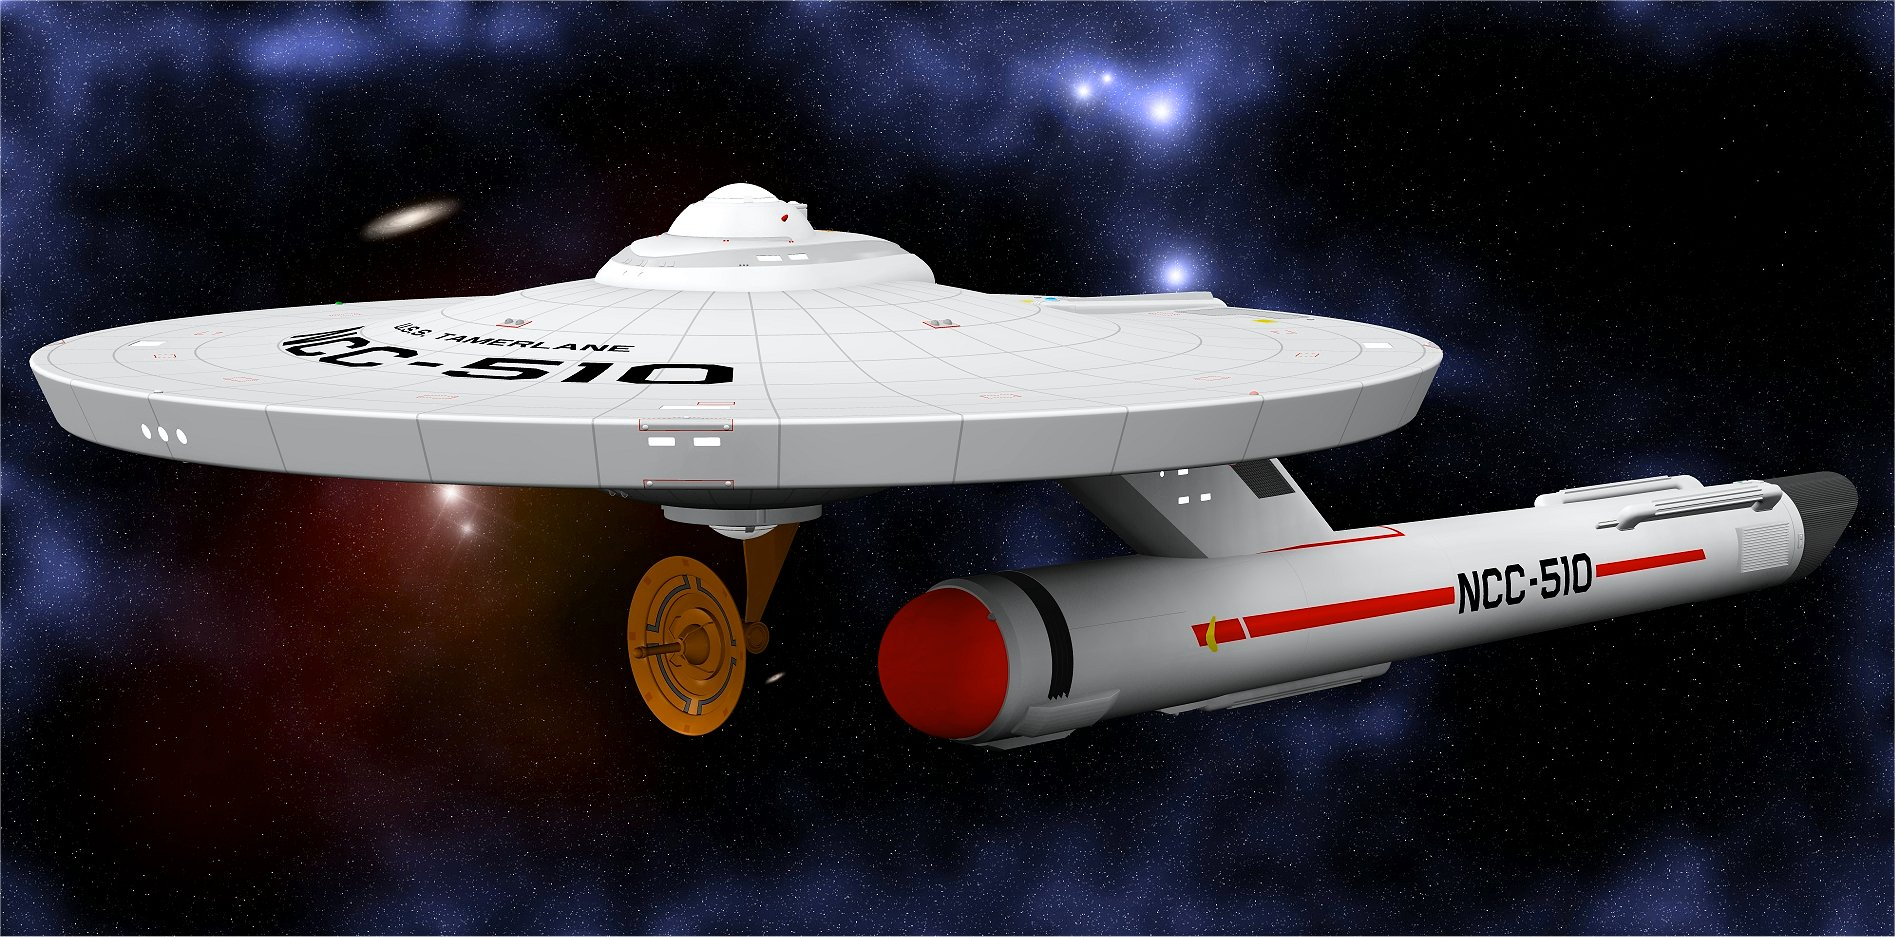 USS Tamerlane - OBJ version by Greywolf-Starkiller